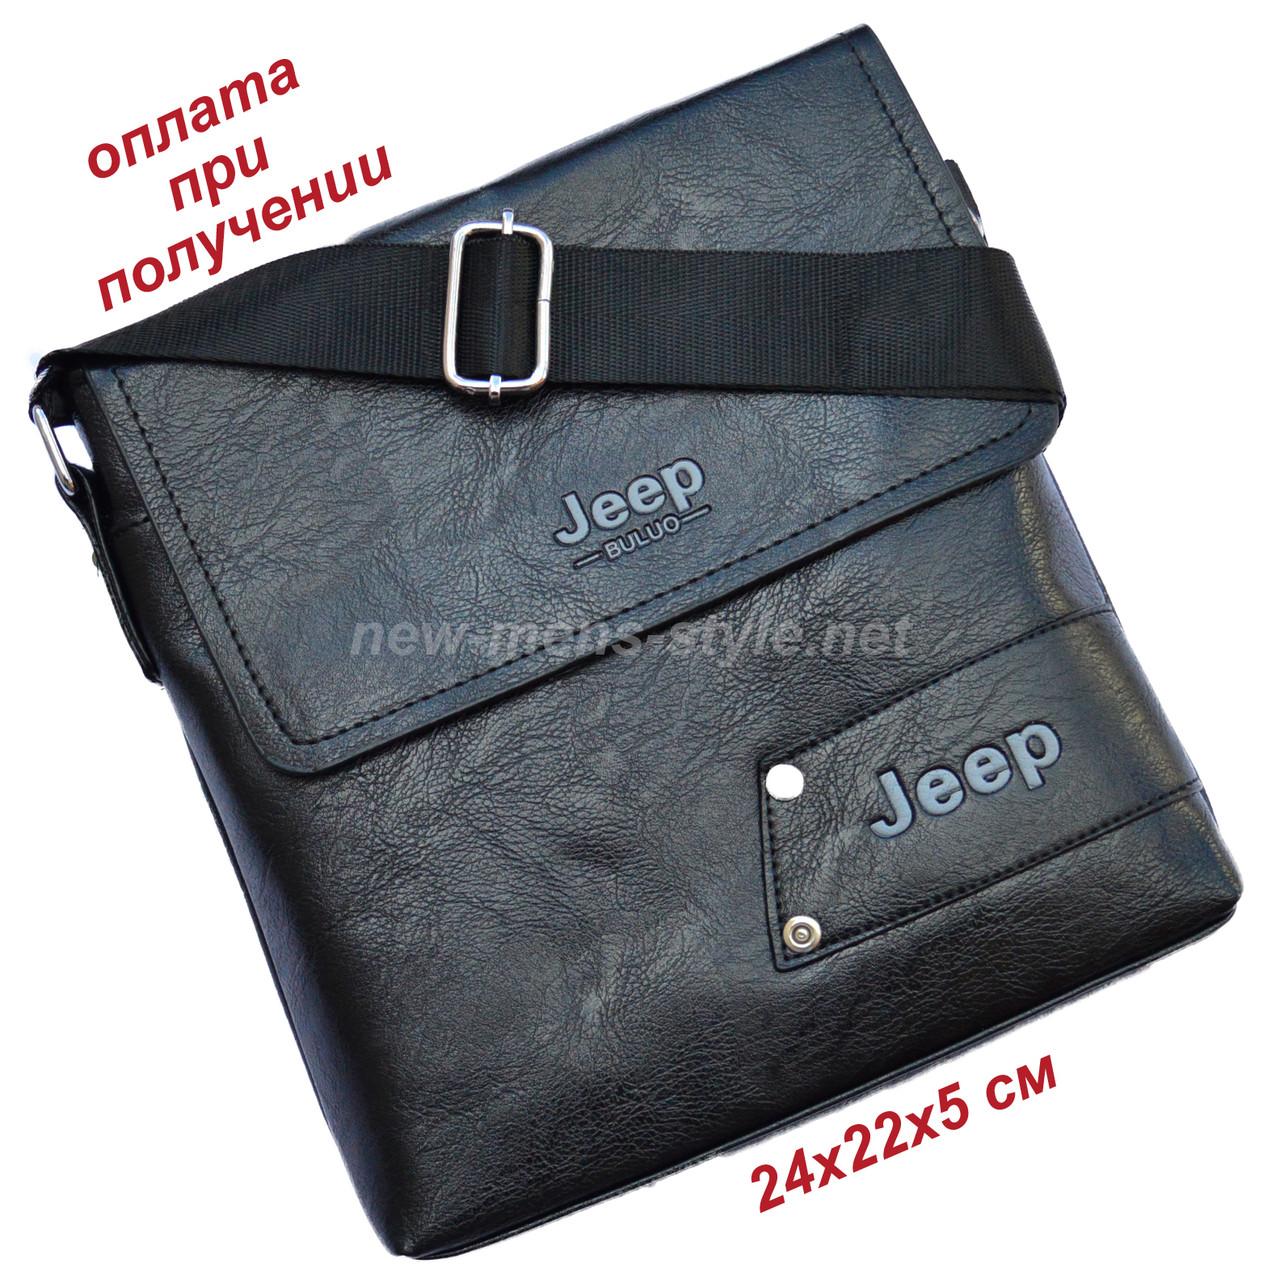 Мужская фирменная чоловіча кожаная сумка барсетка через плечо Jeep